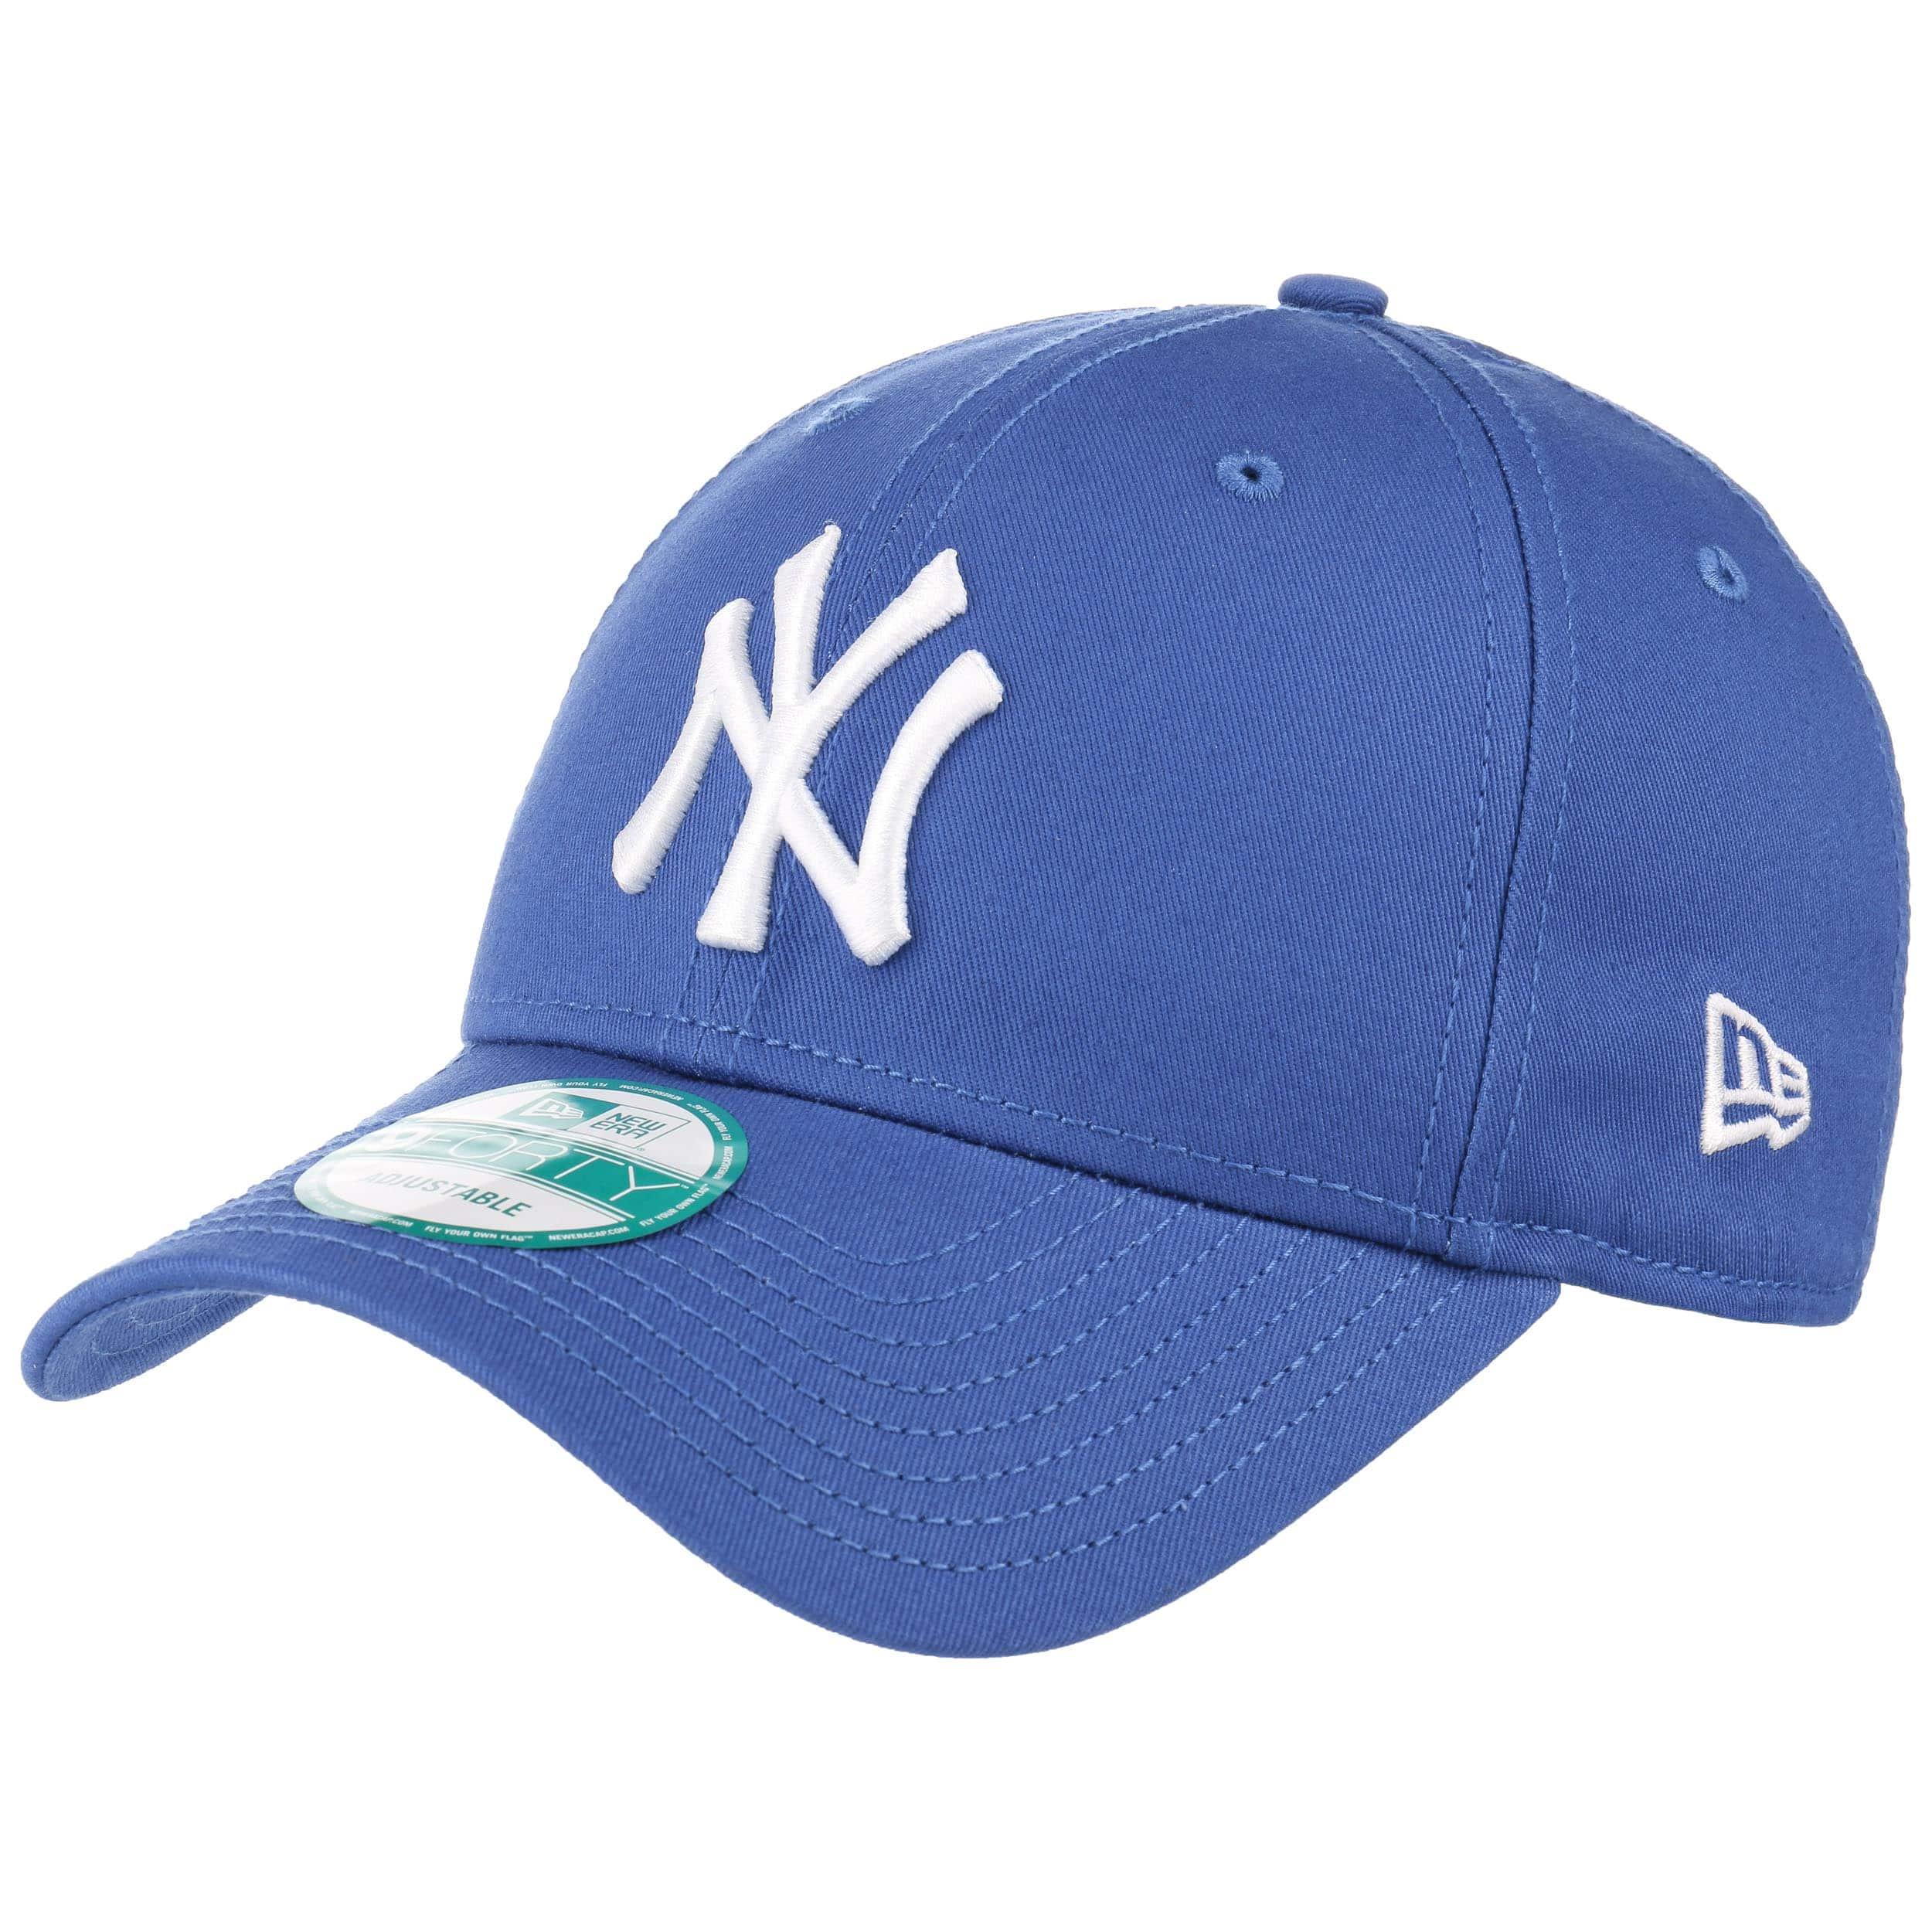 28f7f019698 ... 9Forty League Essential NY Cap by New Era - black-black 2 ...